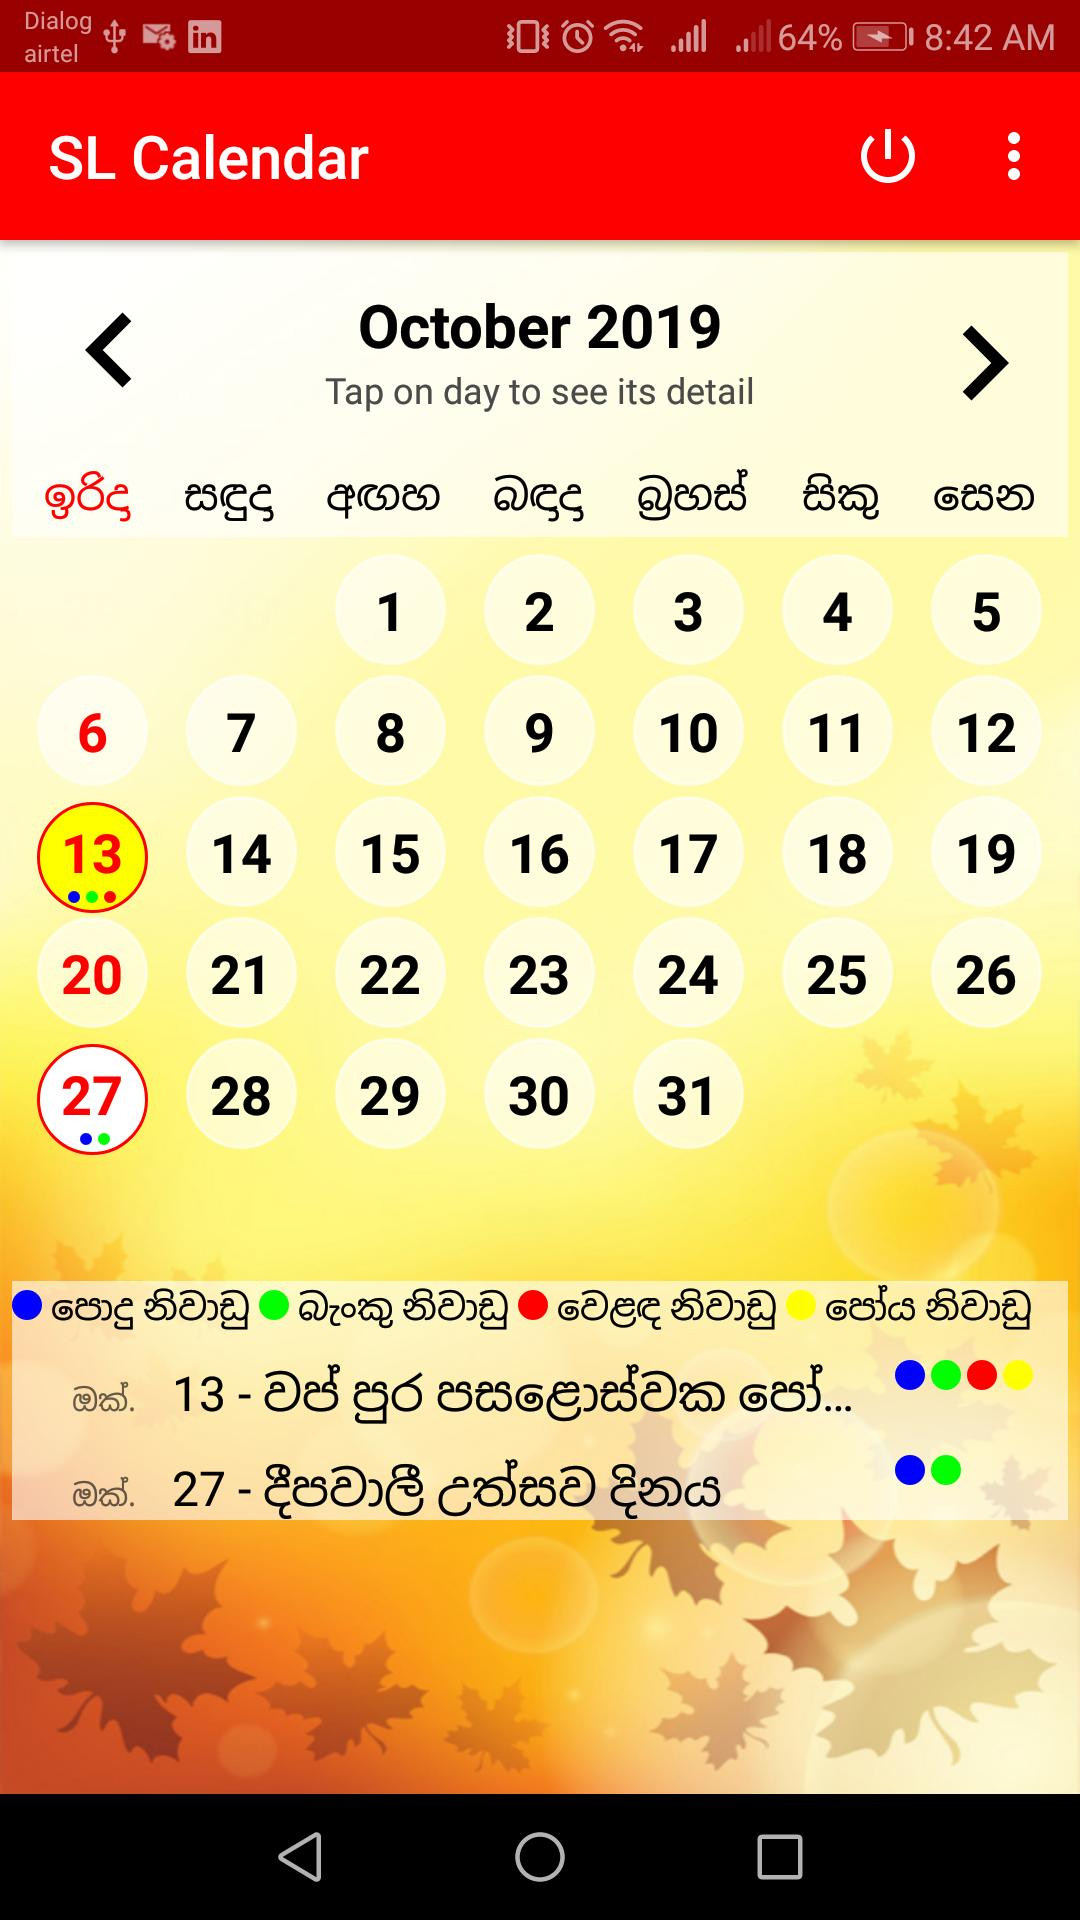 Sri Lanka Calendar 2020 For Android - Apk Download